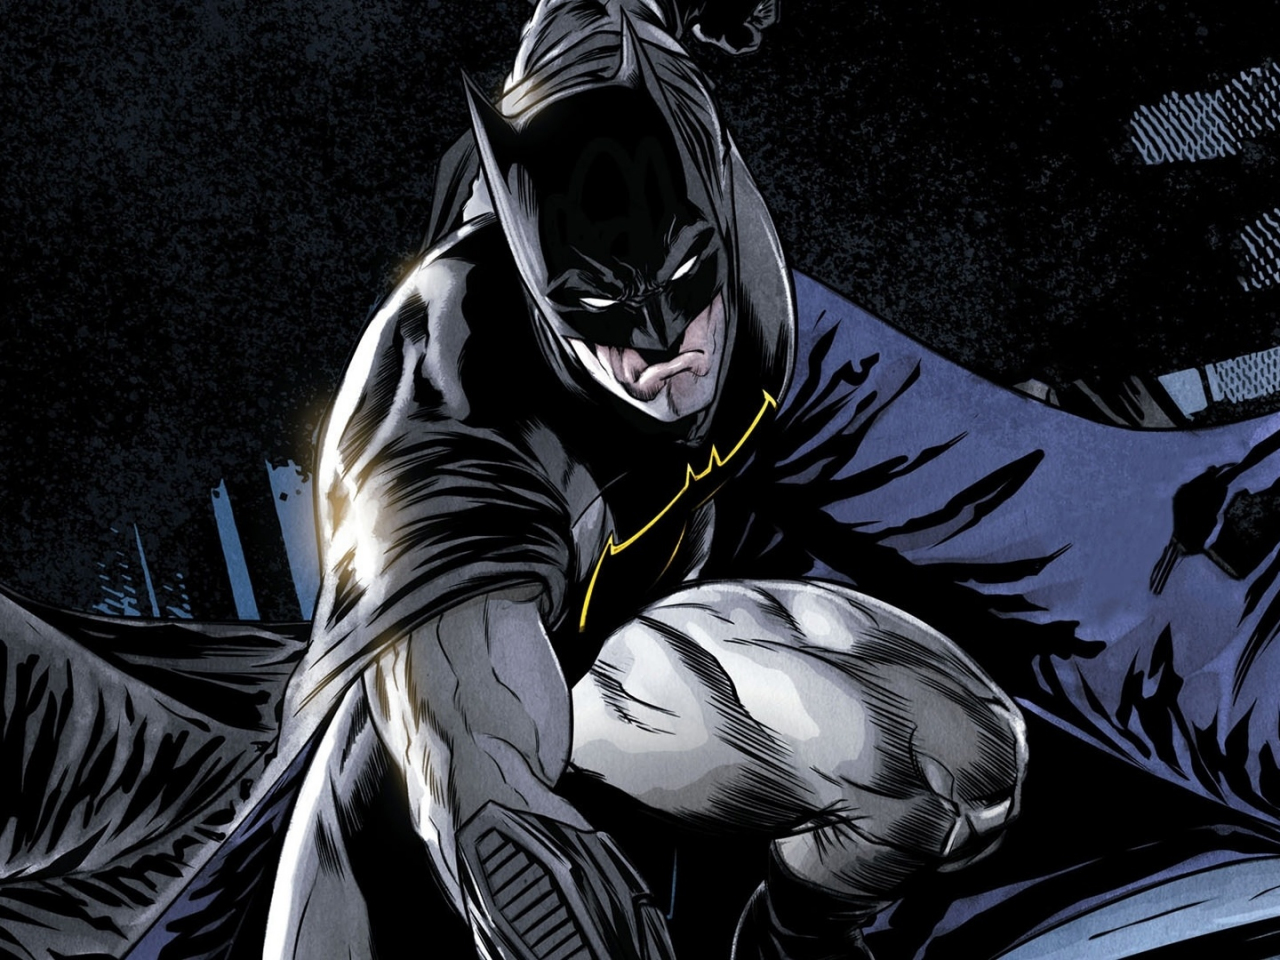 Comics, batman, dark knight, superhero, 1280x960 wallpaper